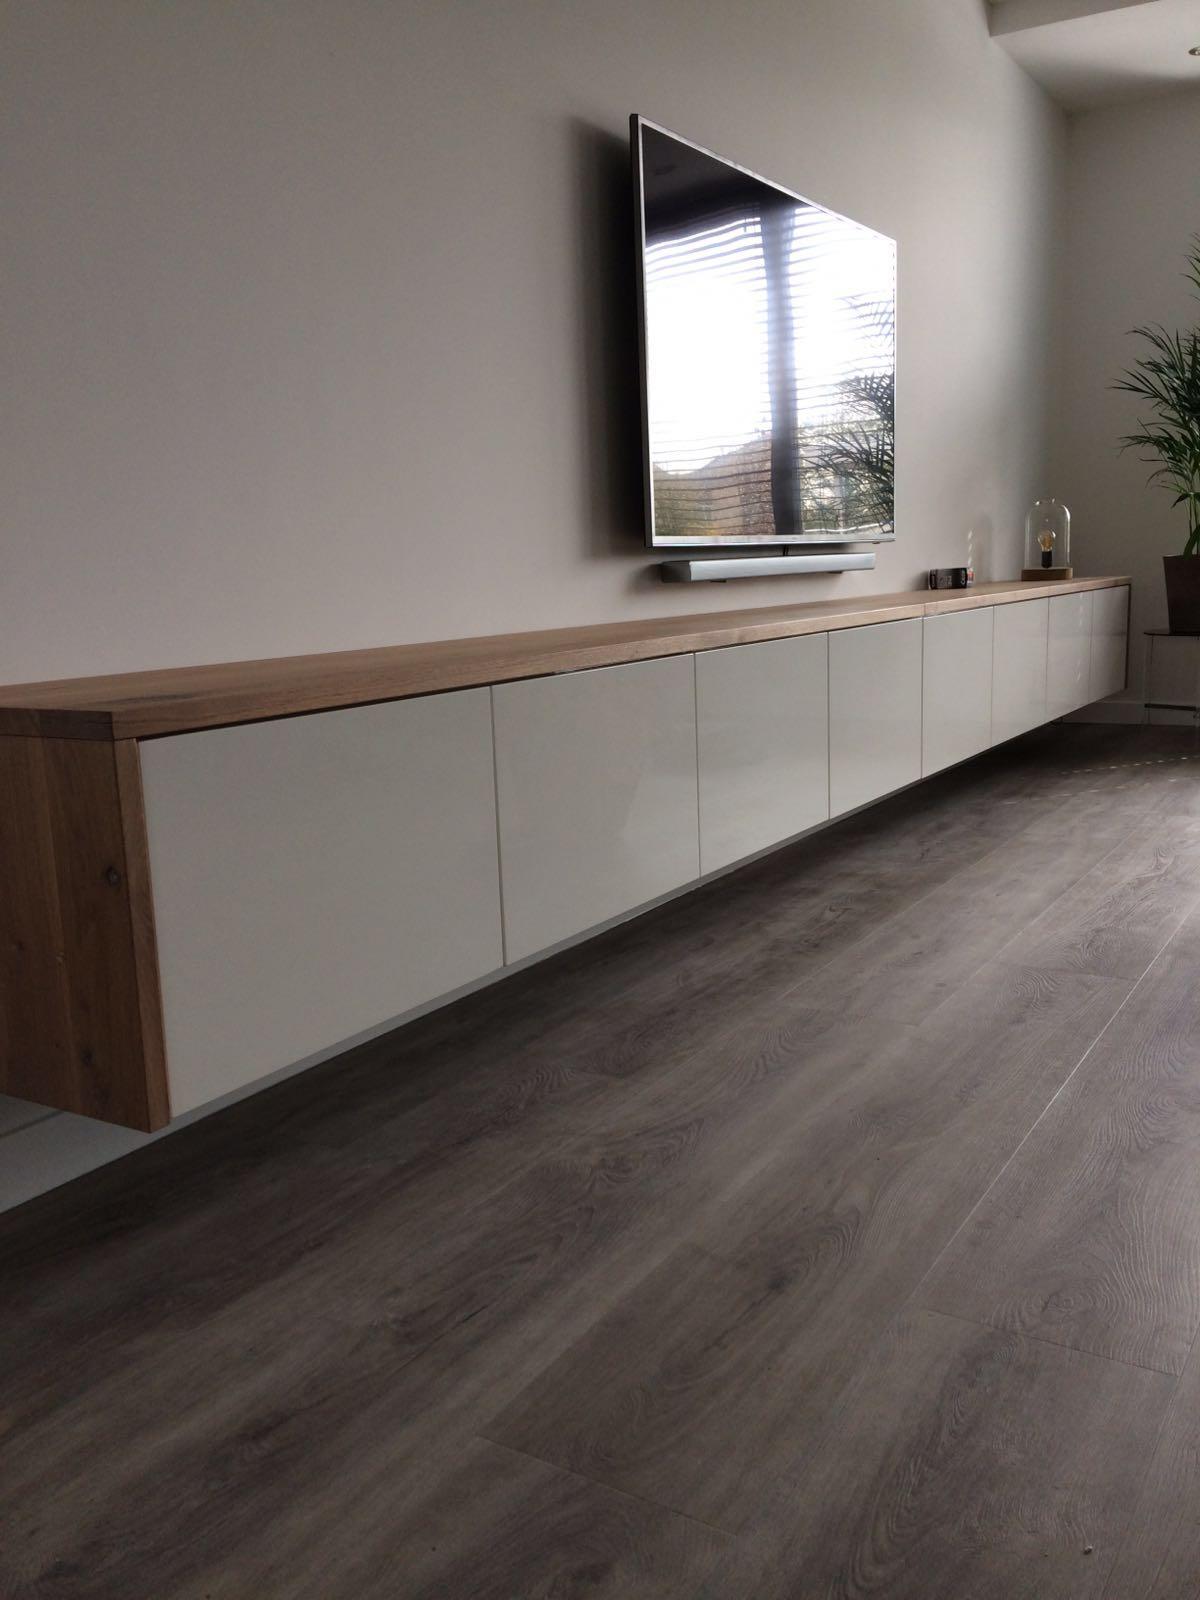 Zwevend tv meubel p j van der vegt for Modern tv meubel design